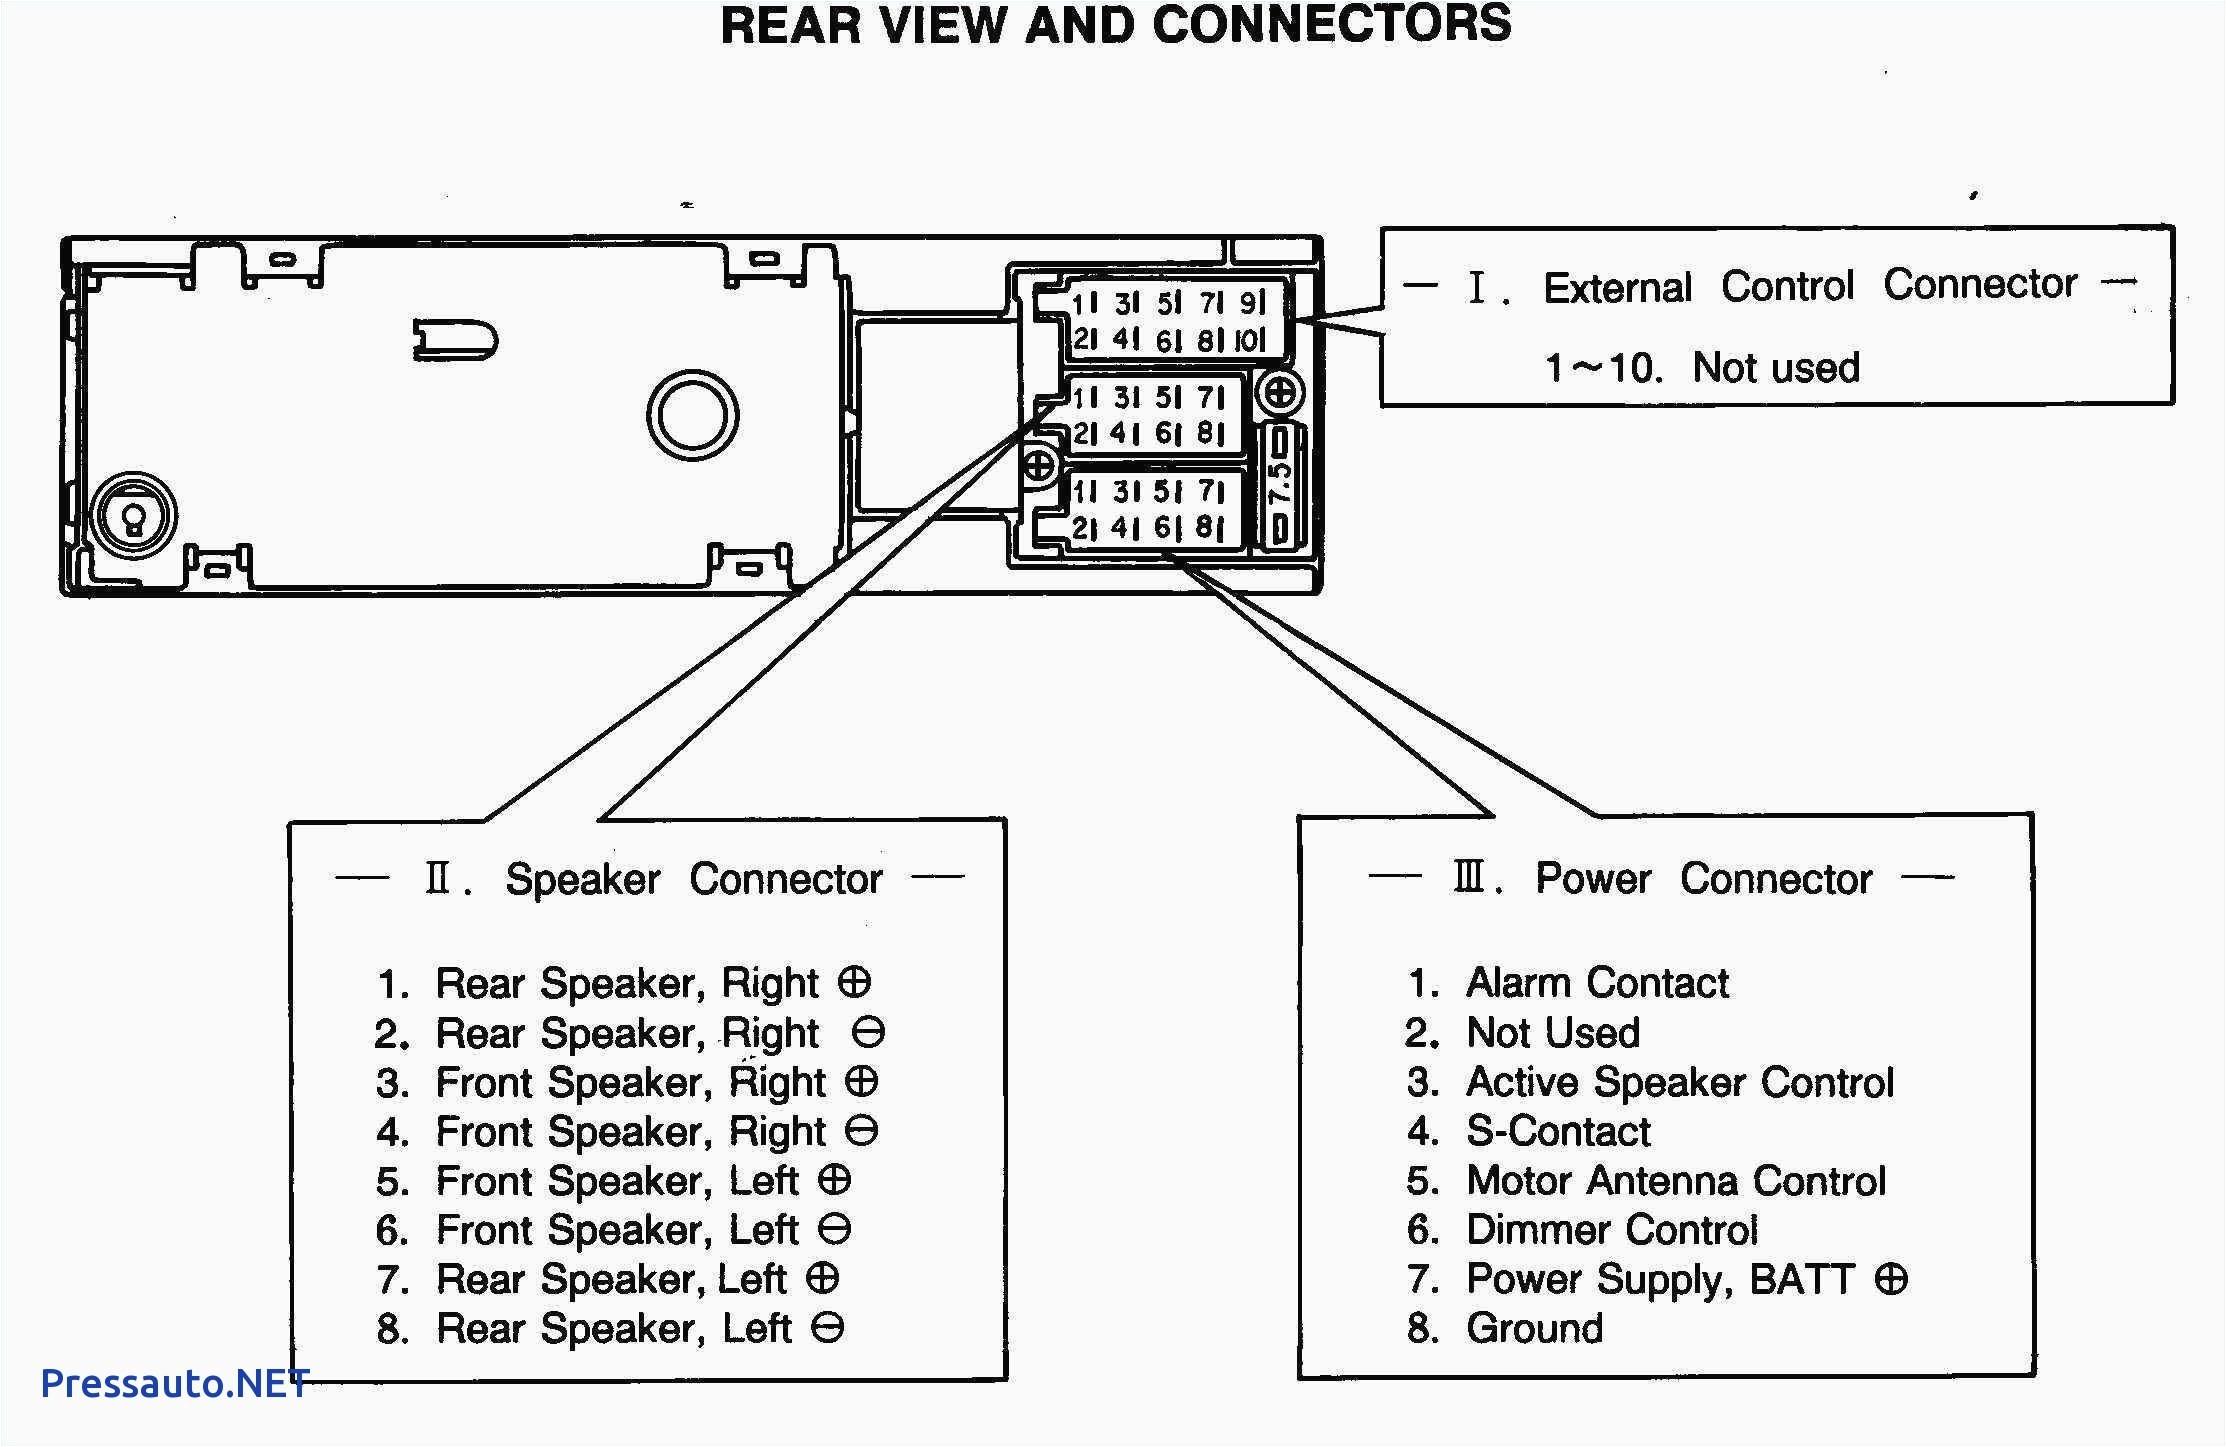 vw radio wire harness wiring diagram expert vw tiguan radio wiring diagram 2002 jetta radio wiring